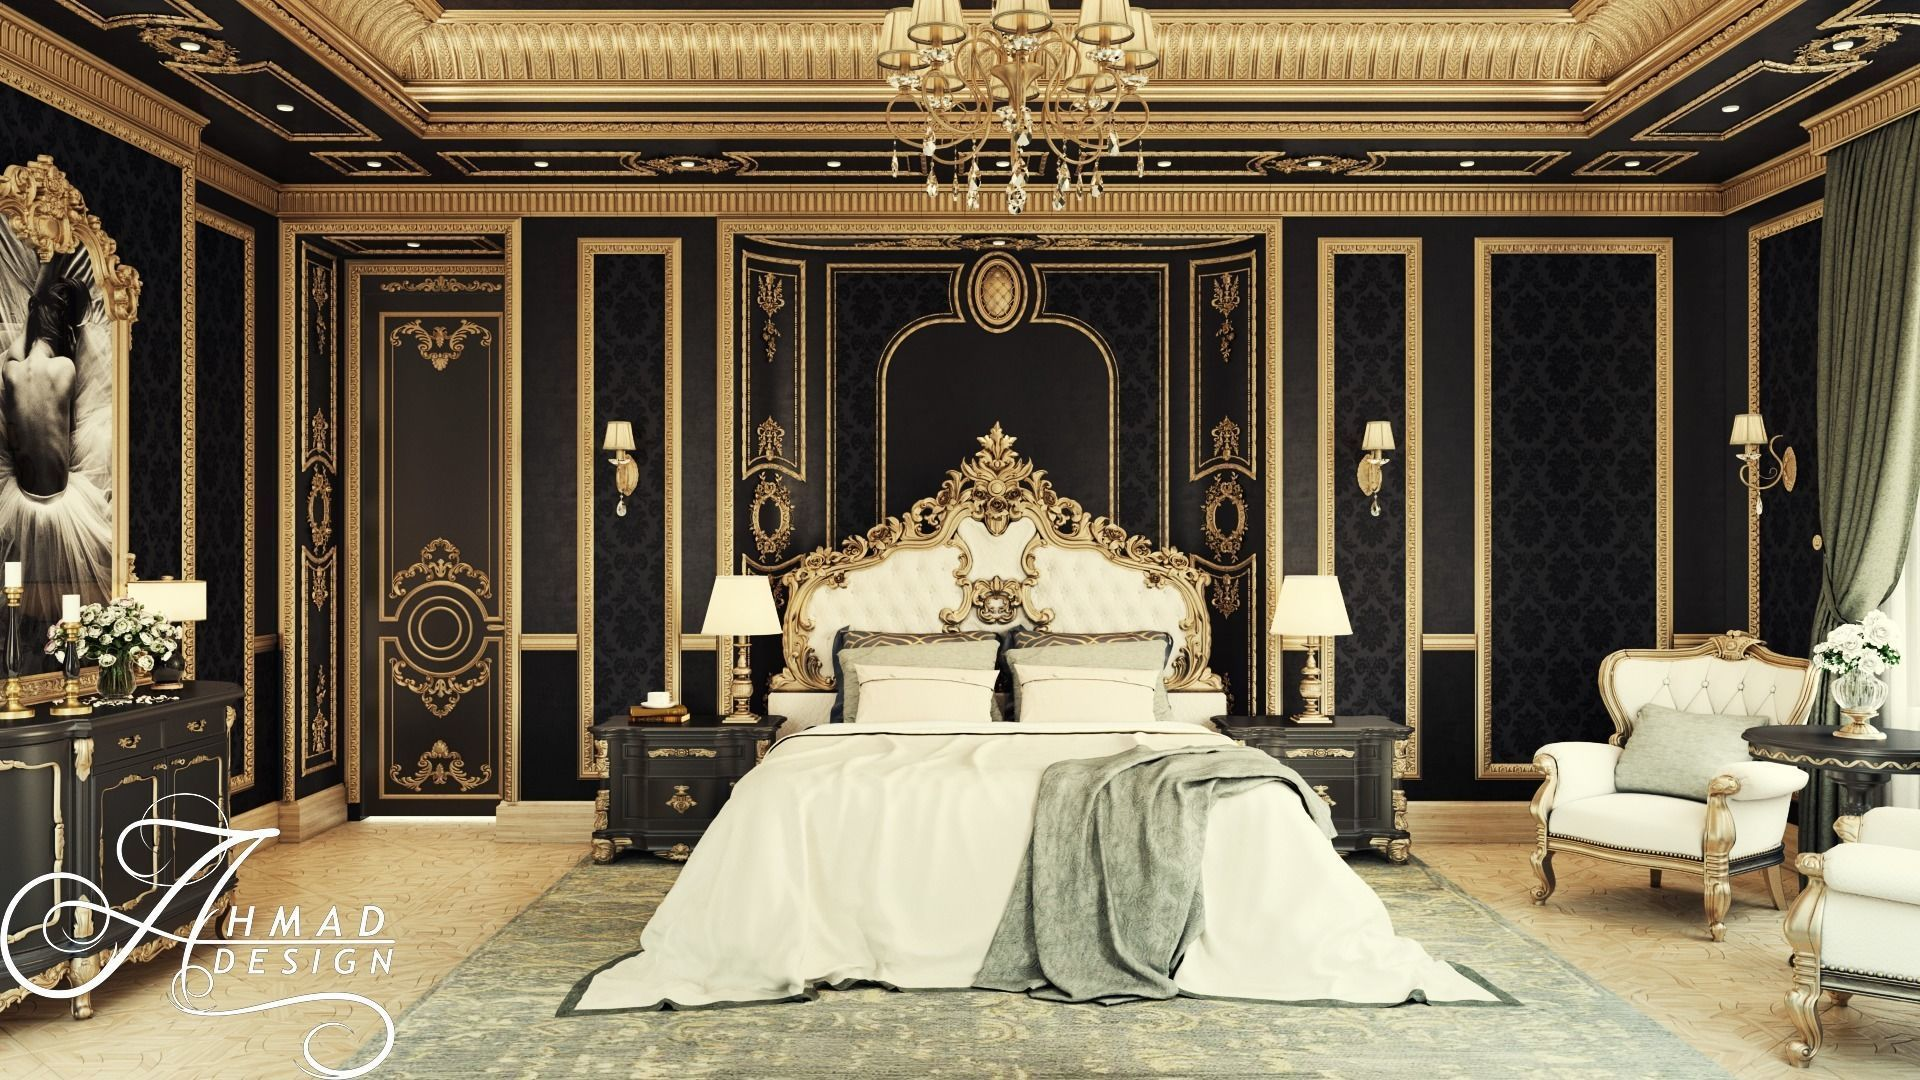 Royal Black and Gold Interior Master Bedroom | 3D model